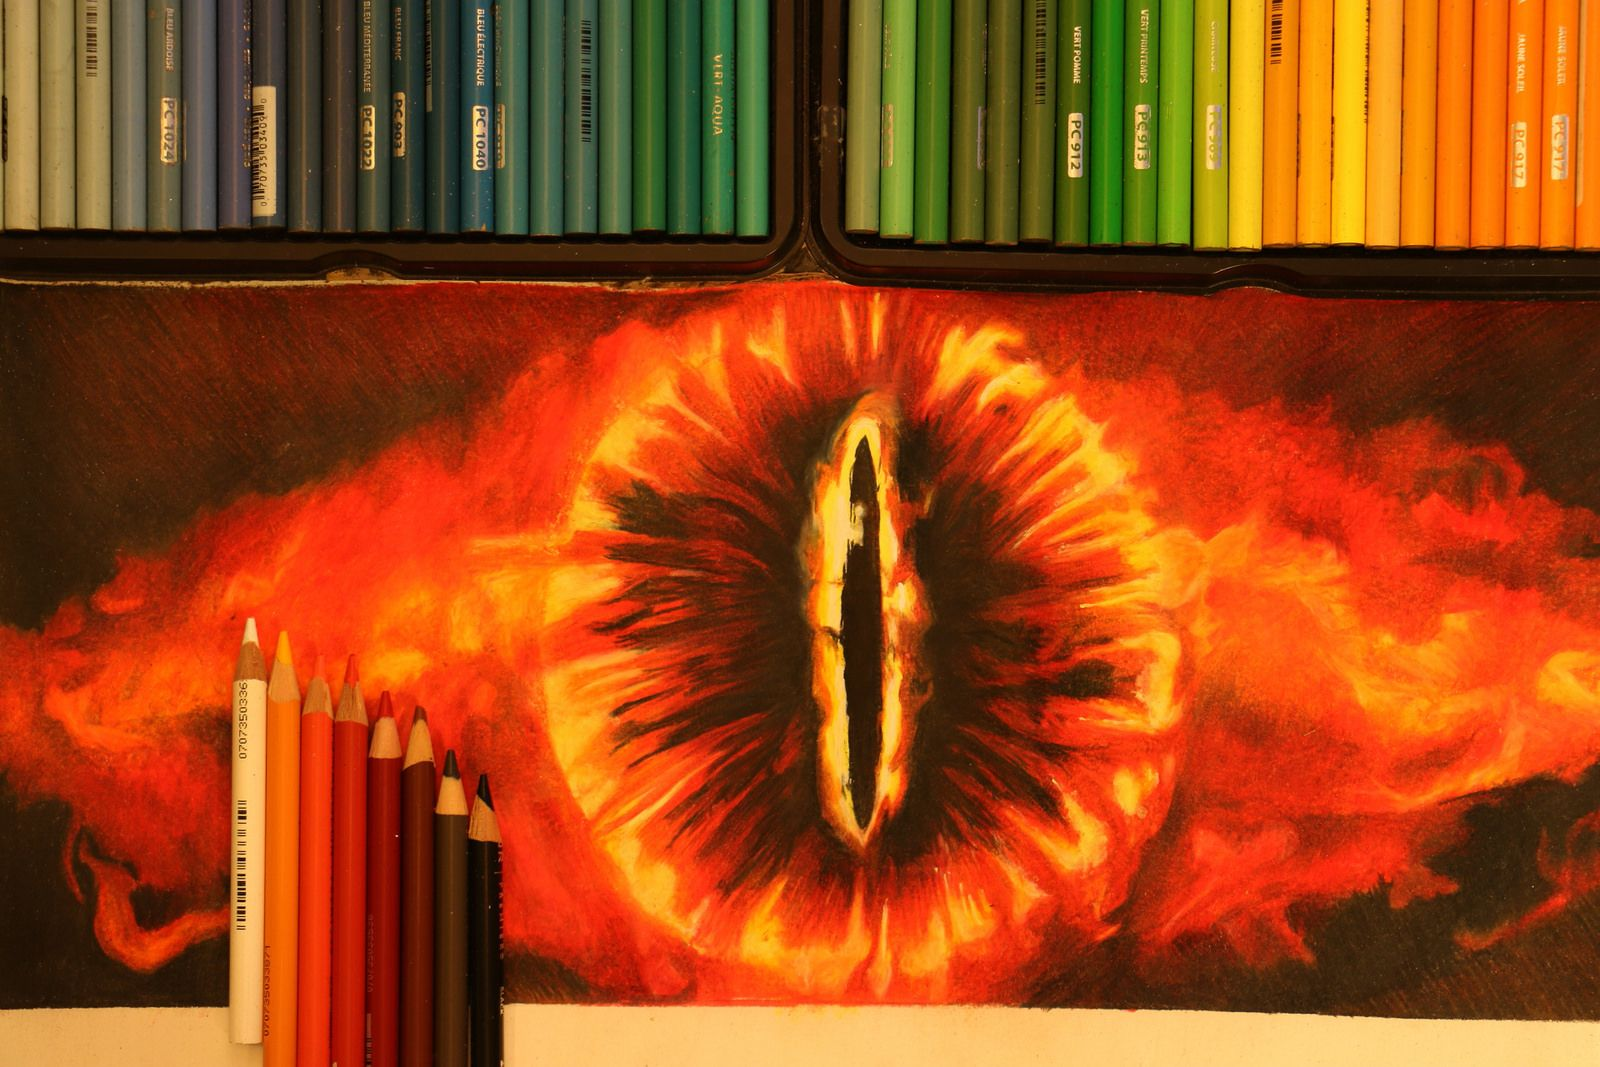 Eye Of Sauron Drawing Lord Of The Rings Geek Art Colorful Drawings Geeky Art